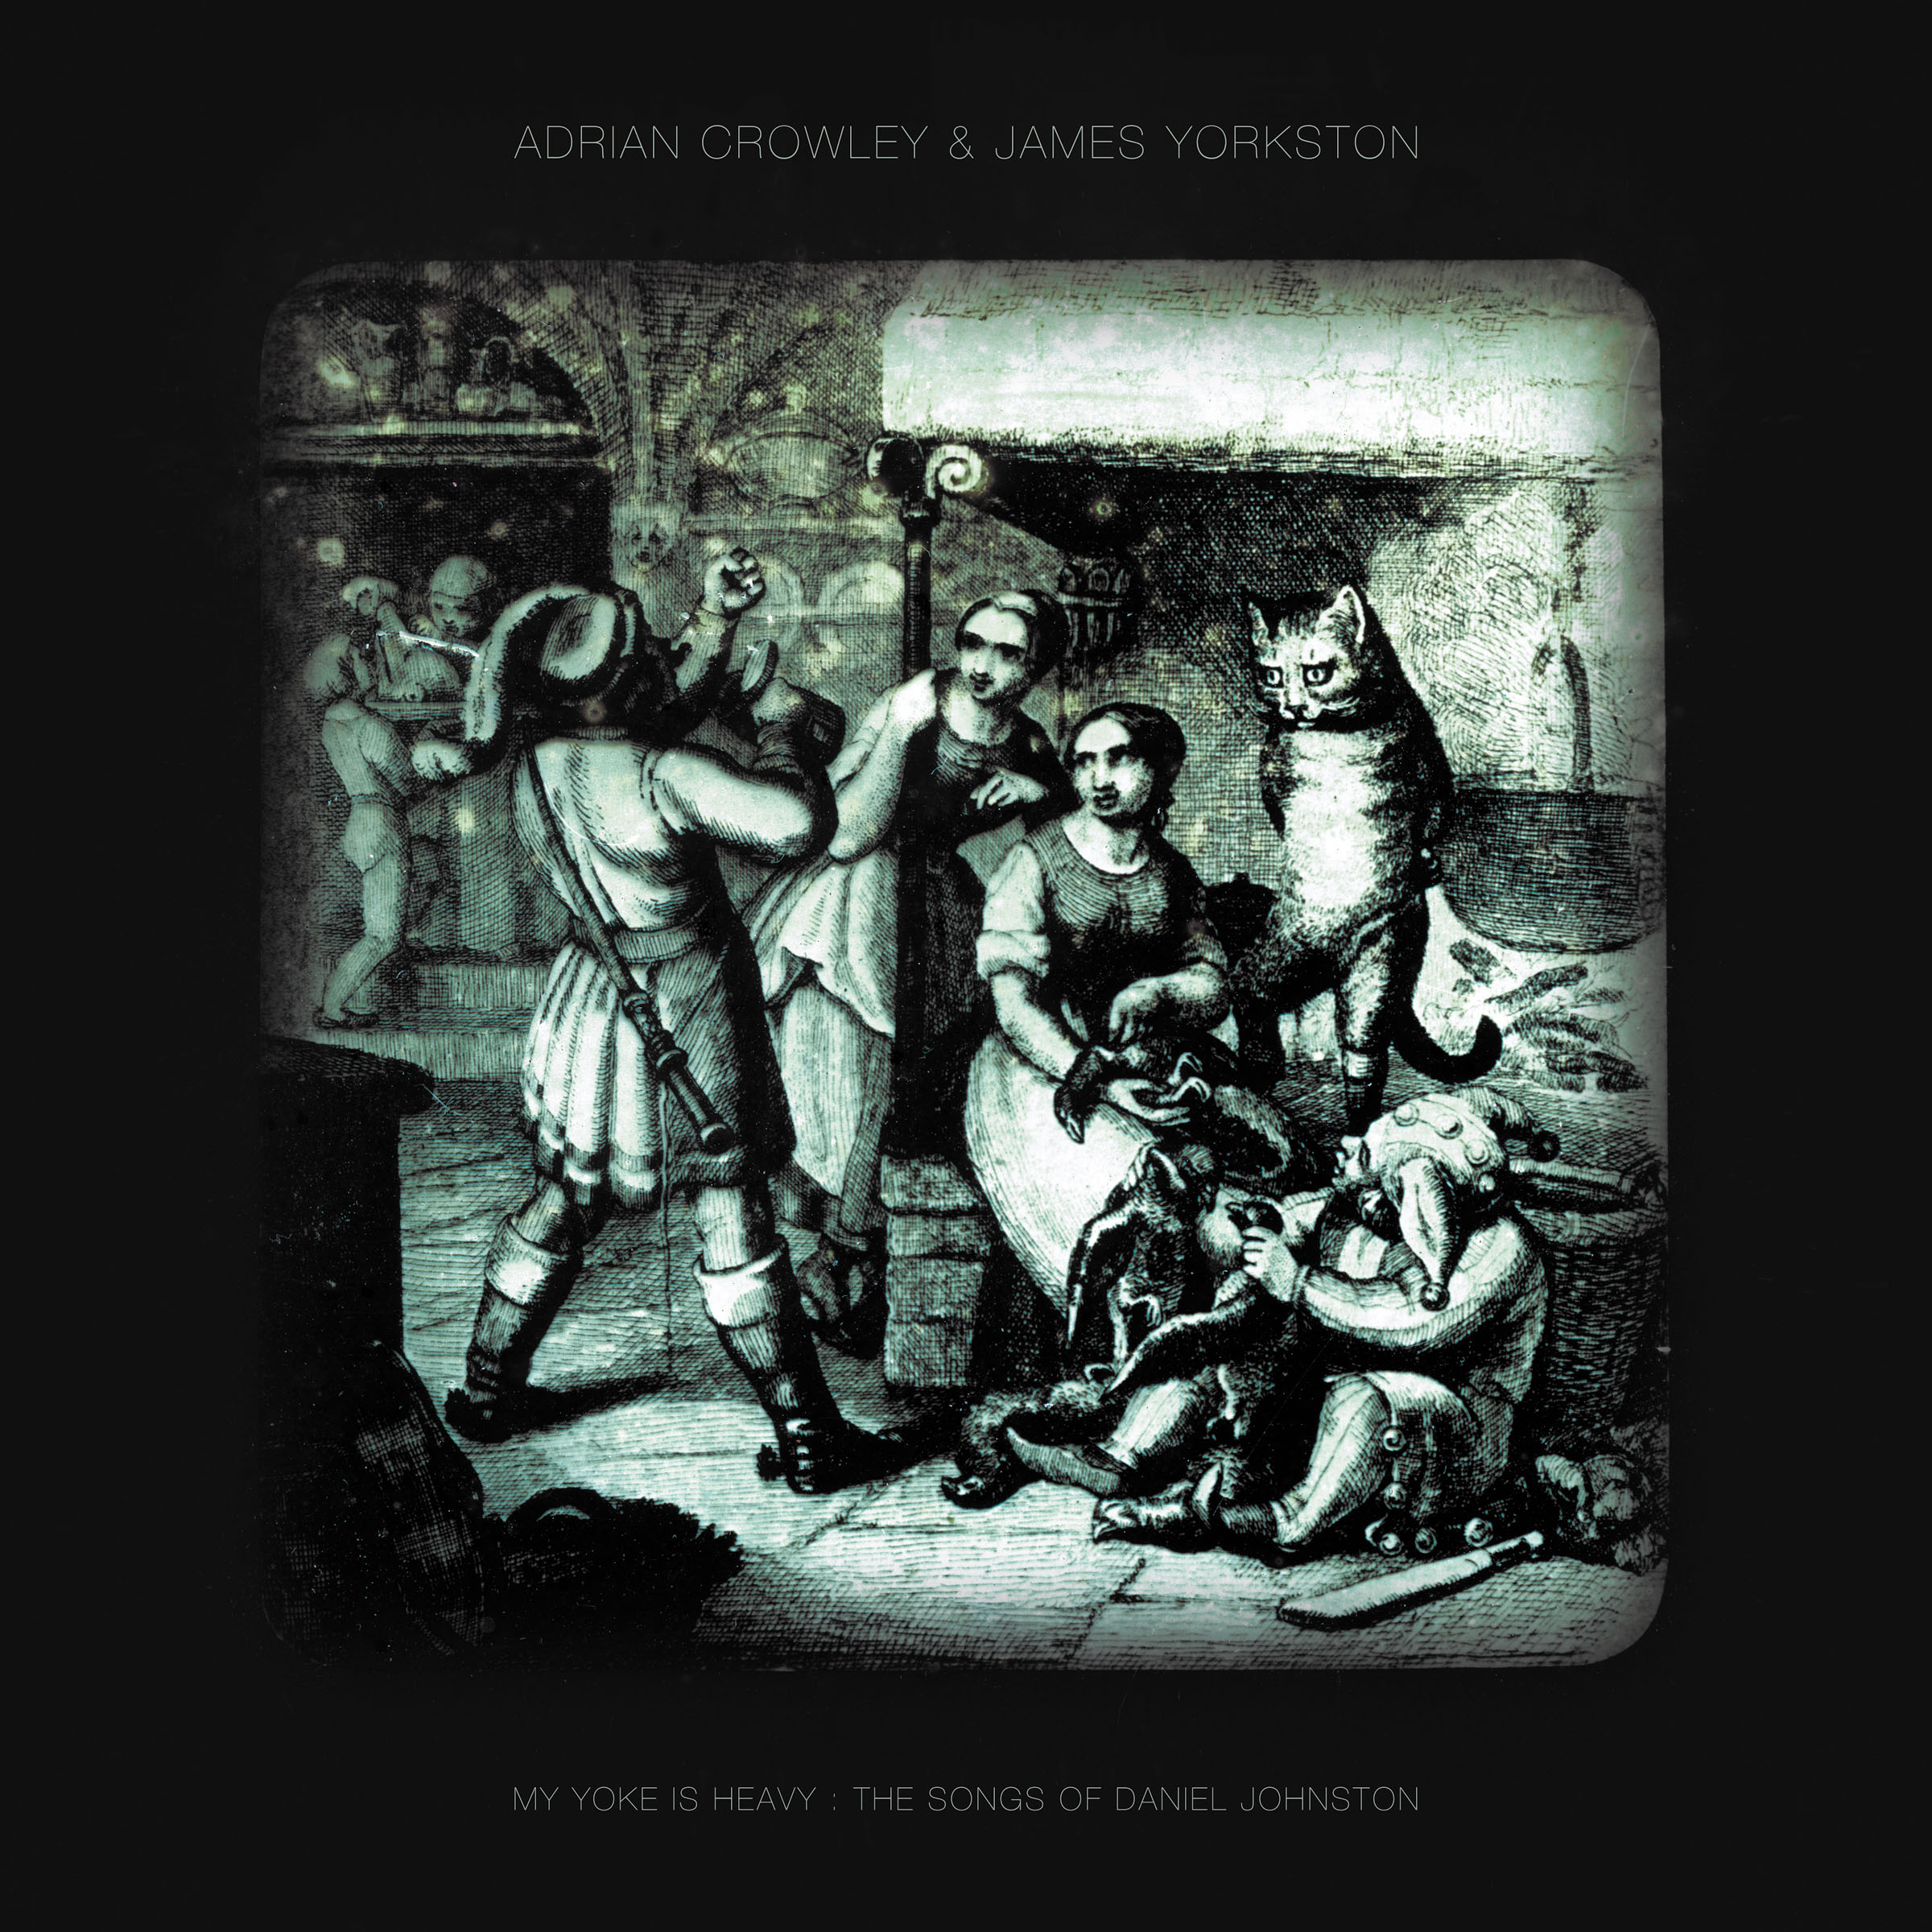 Adrian Crowley feat. James Yorkston - My Yoke Is Heavy: The Songs of Daniel Johnston' - Digital Album (2013) - Adrian Crowley